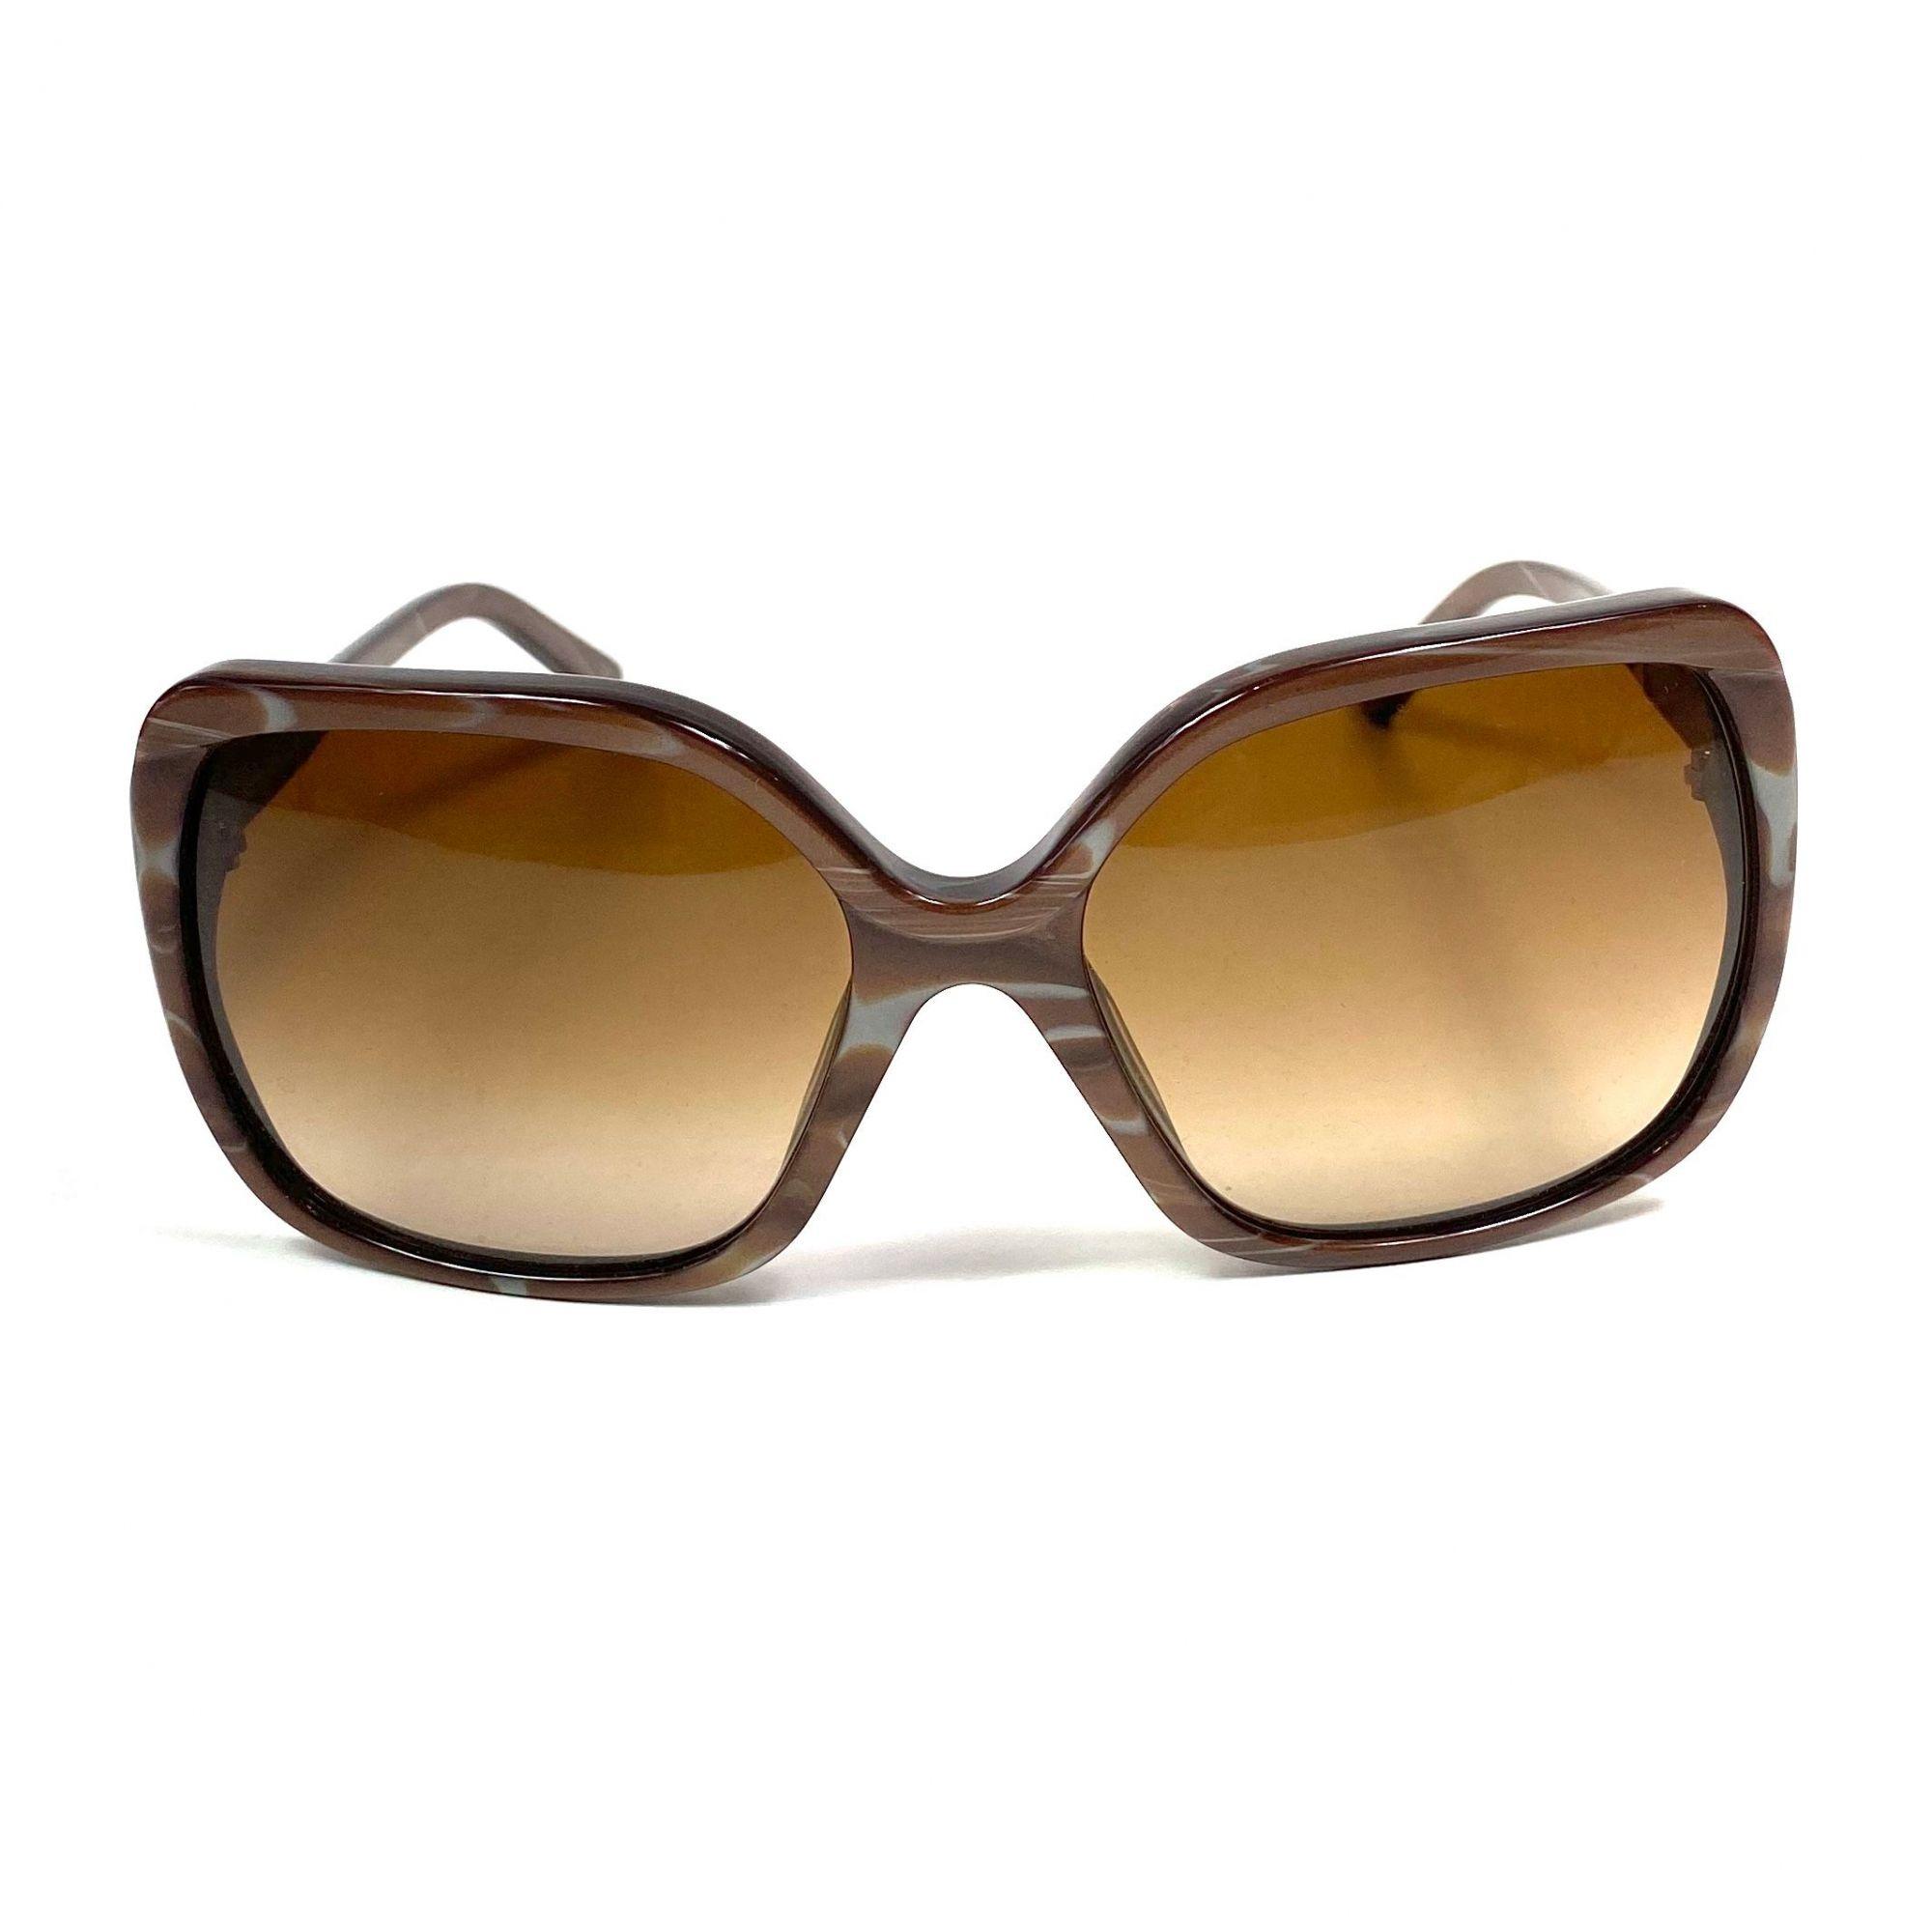 Óculos Dolce & Gabbana DG4049 892/13